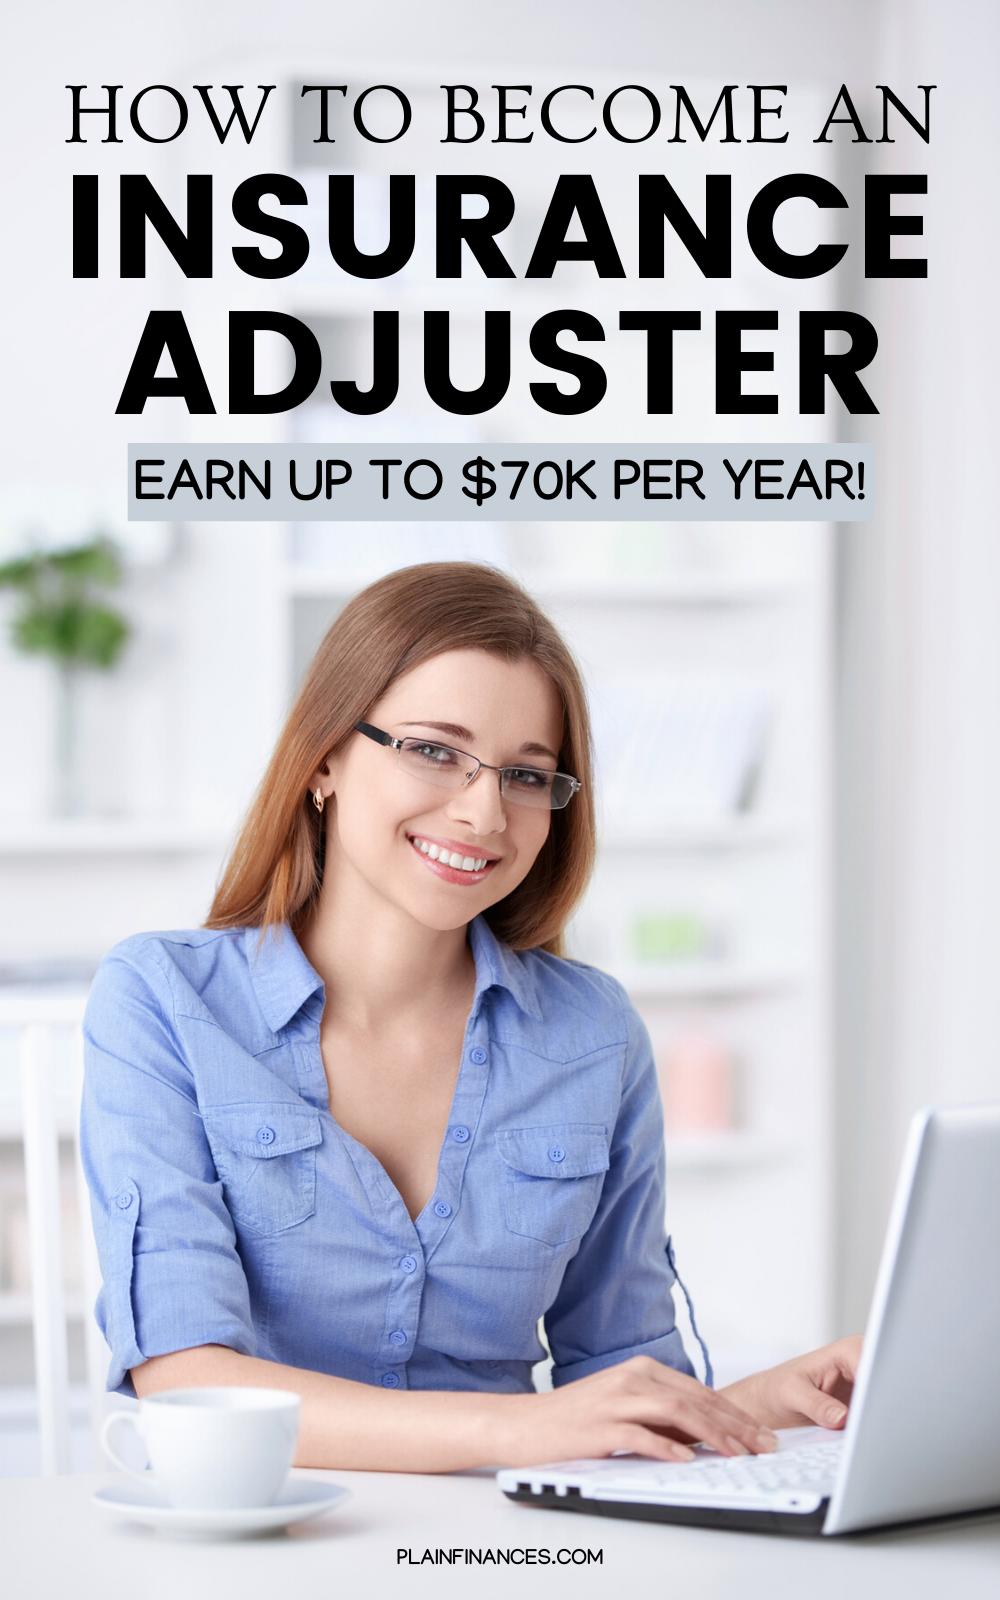 Insurance Adjuster A Rewarding Career In The Insurance Industry Job Career Planning Insurance Industry Business Insurance Money Management